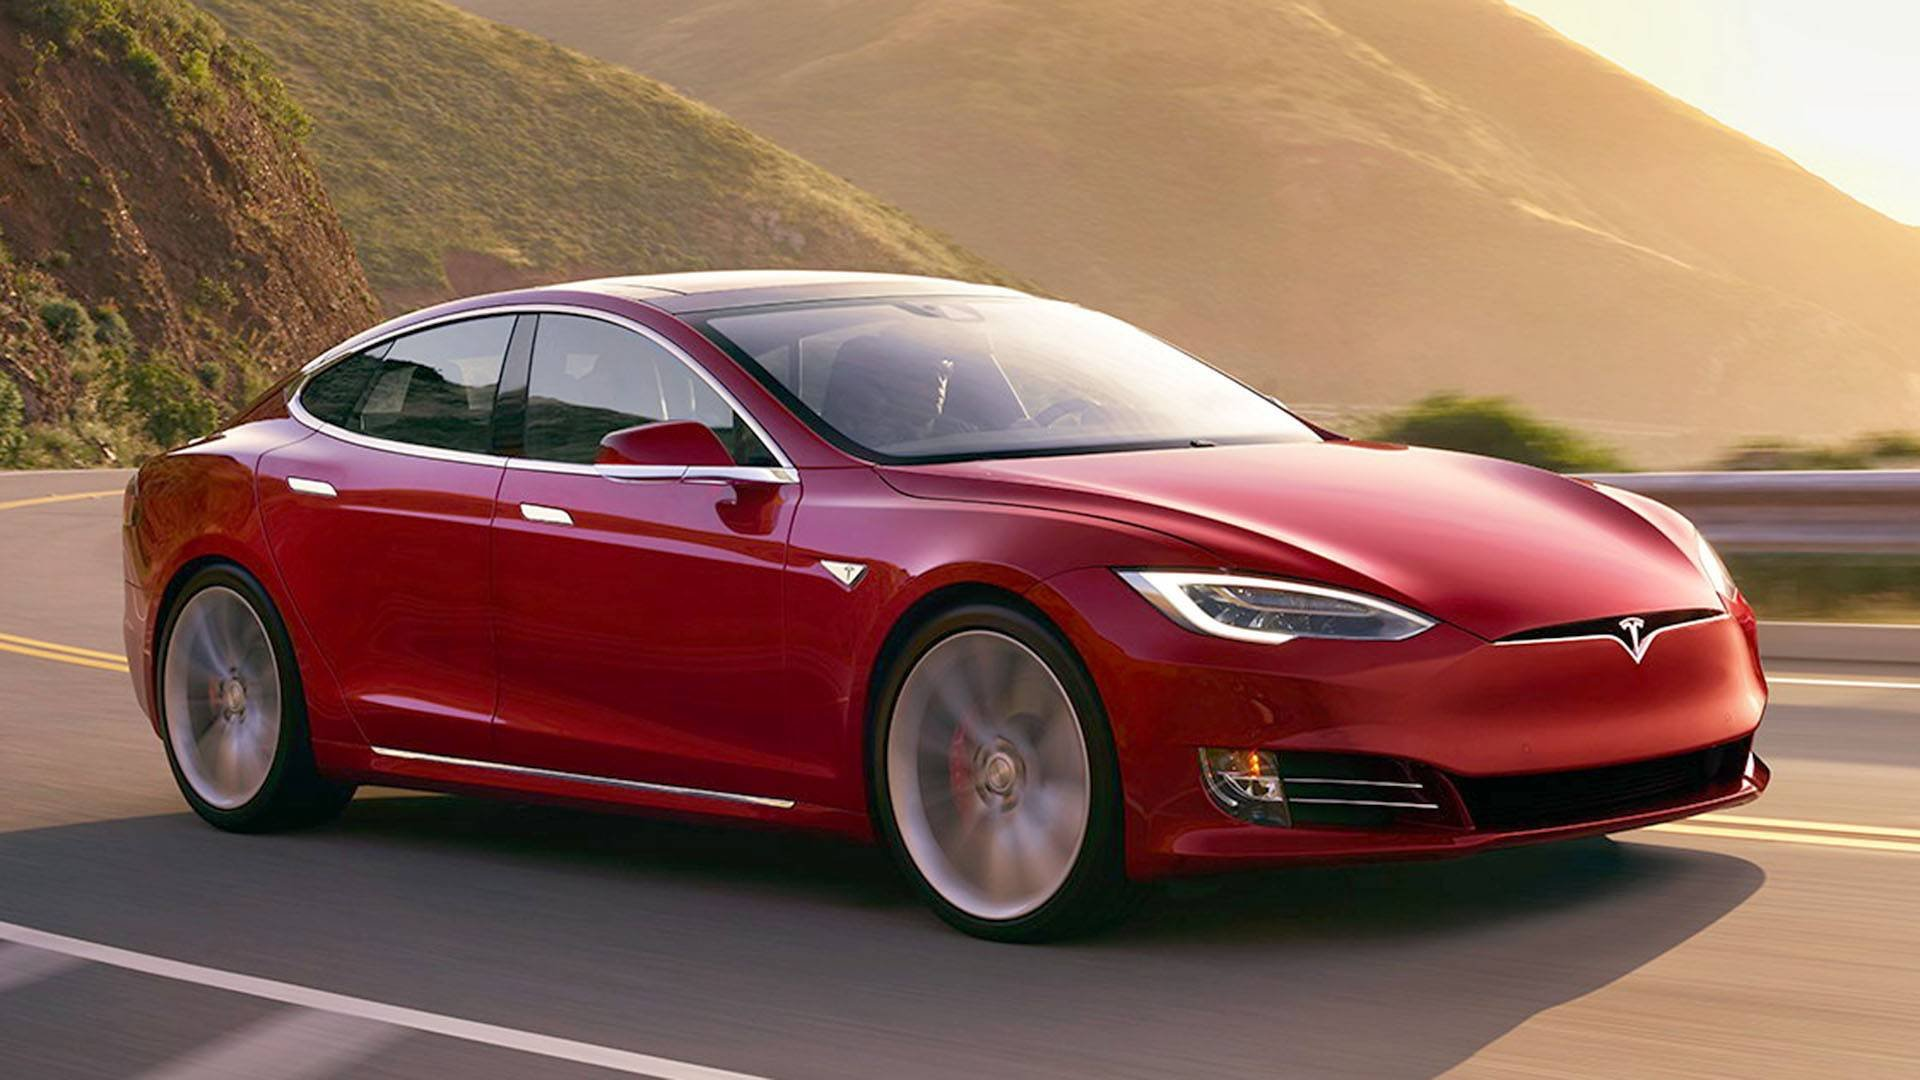 Tesla hd wallpaper 1080